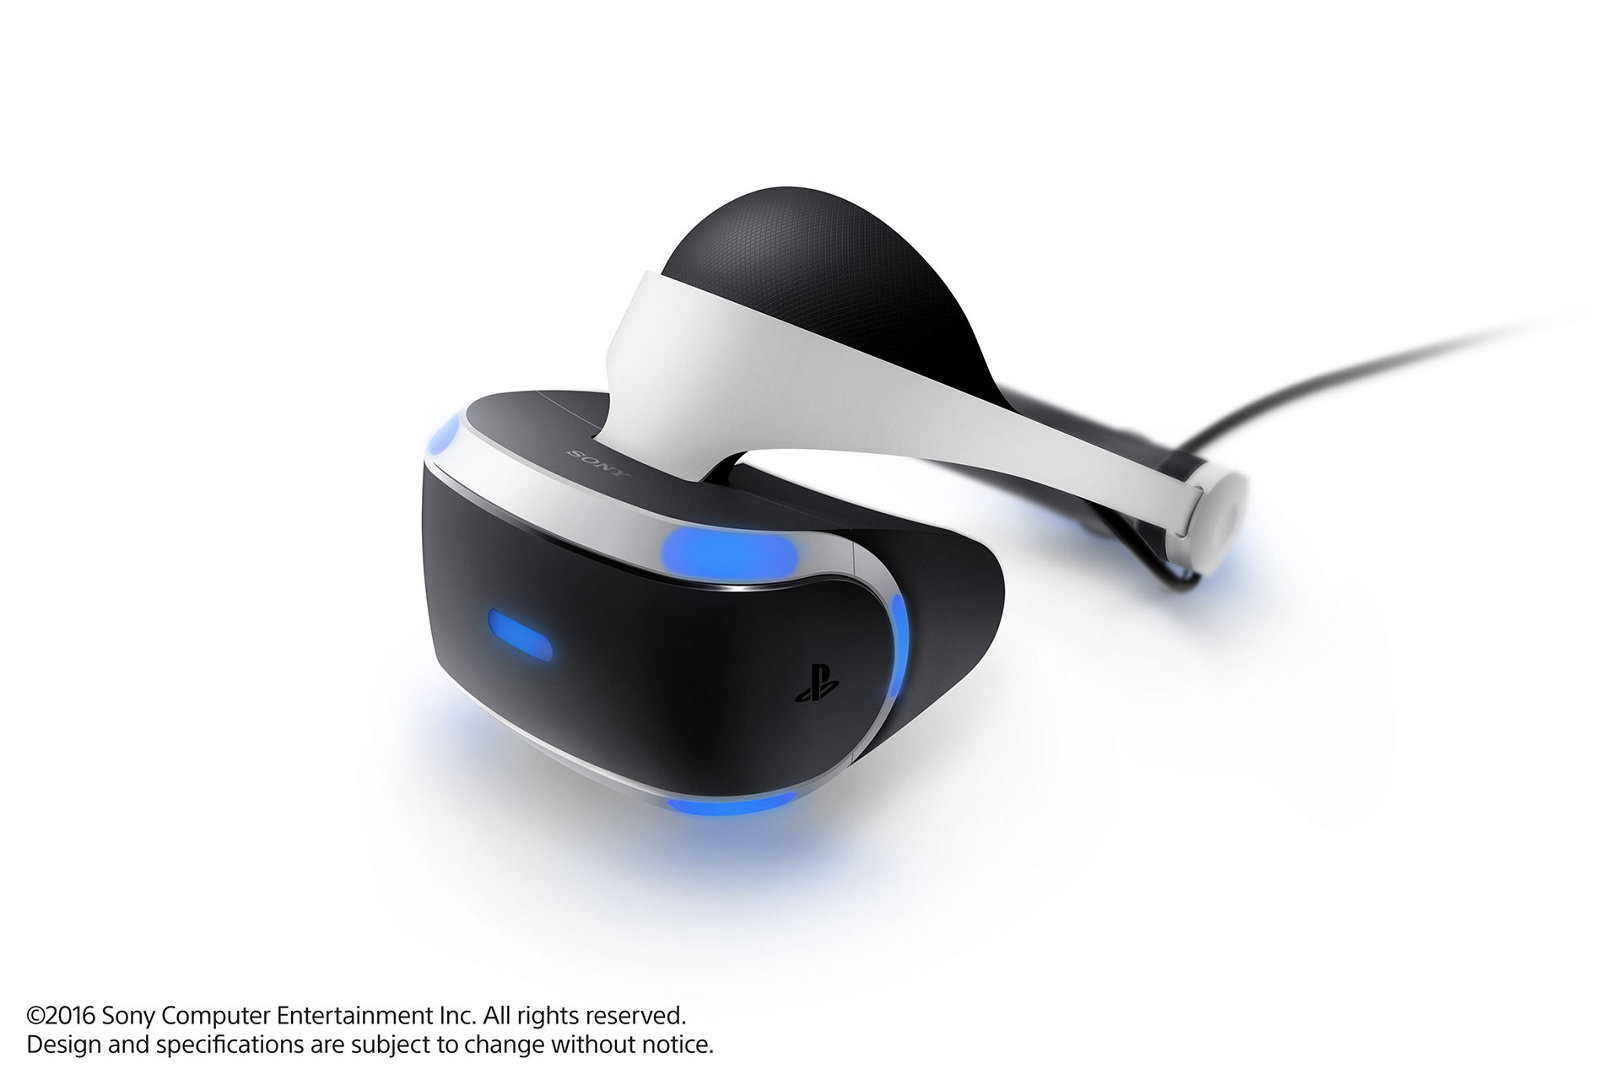 SONY PLAYSTATION VR (Virtual Reality)